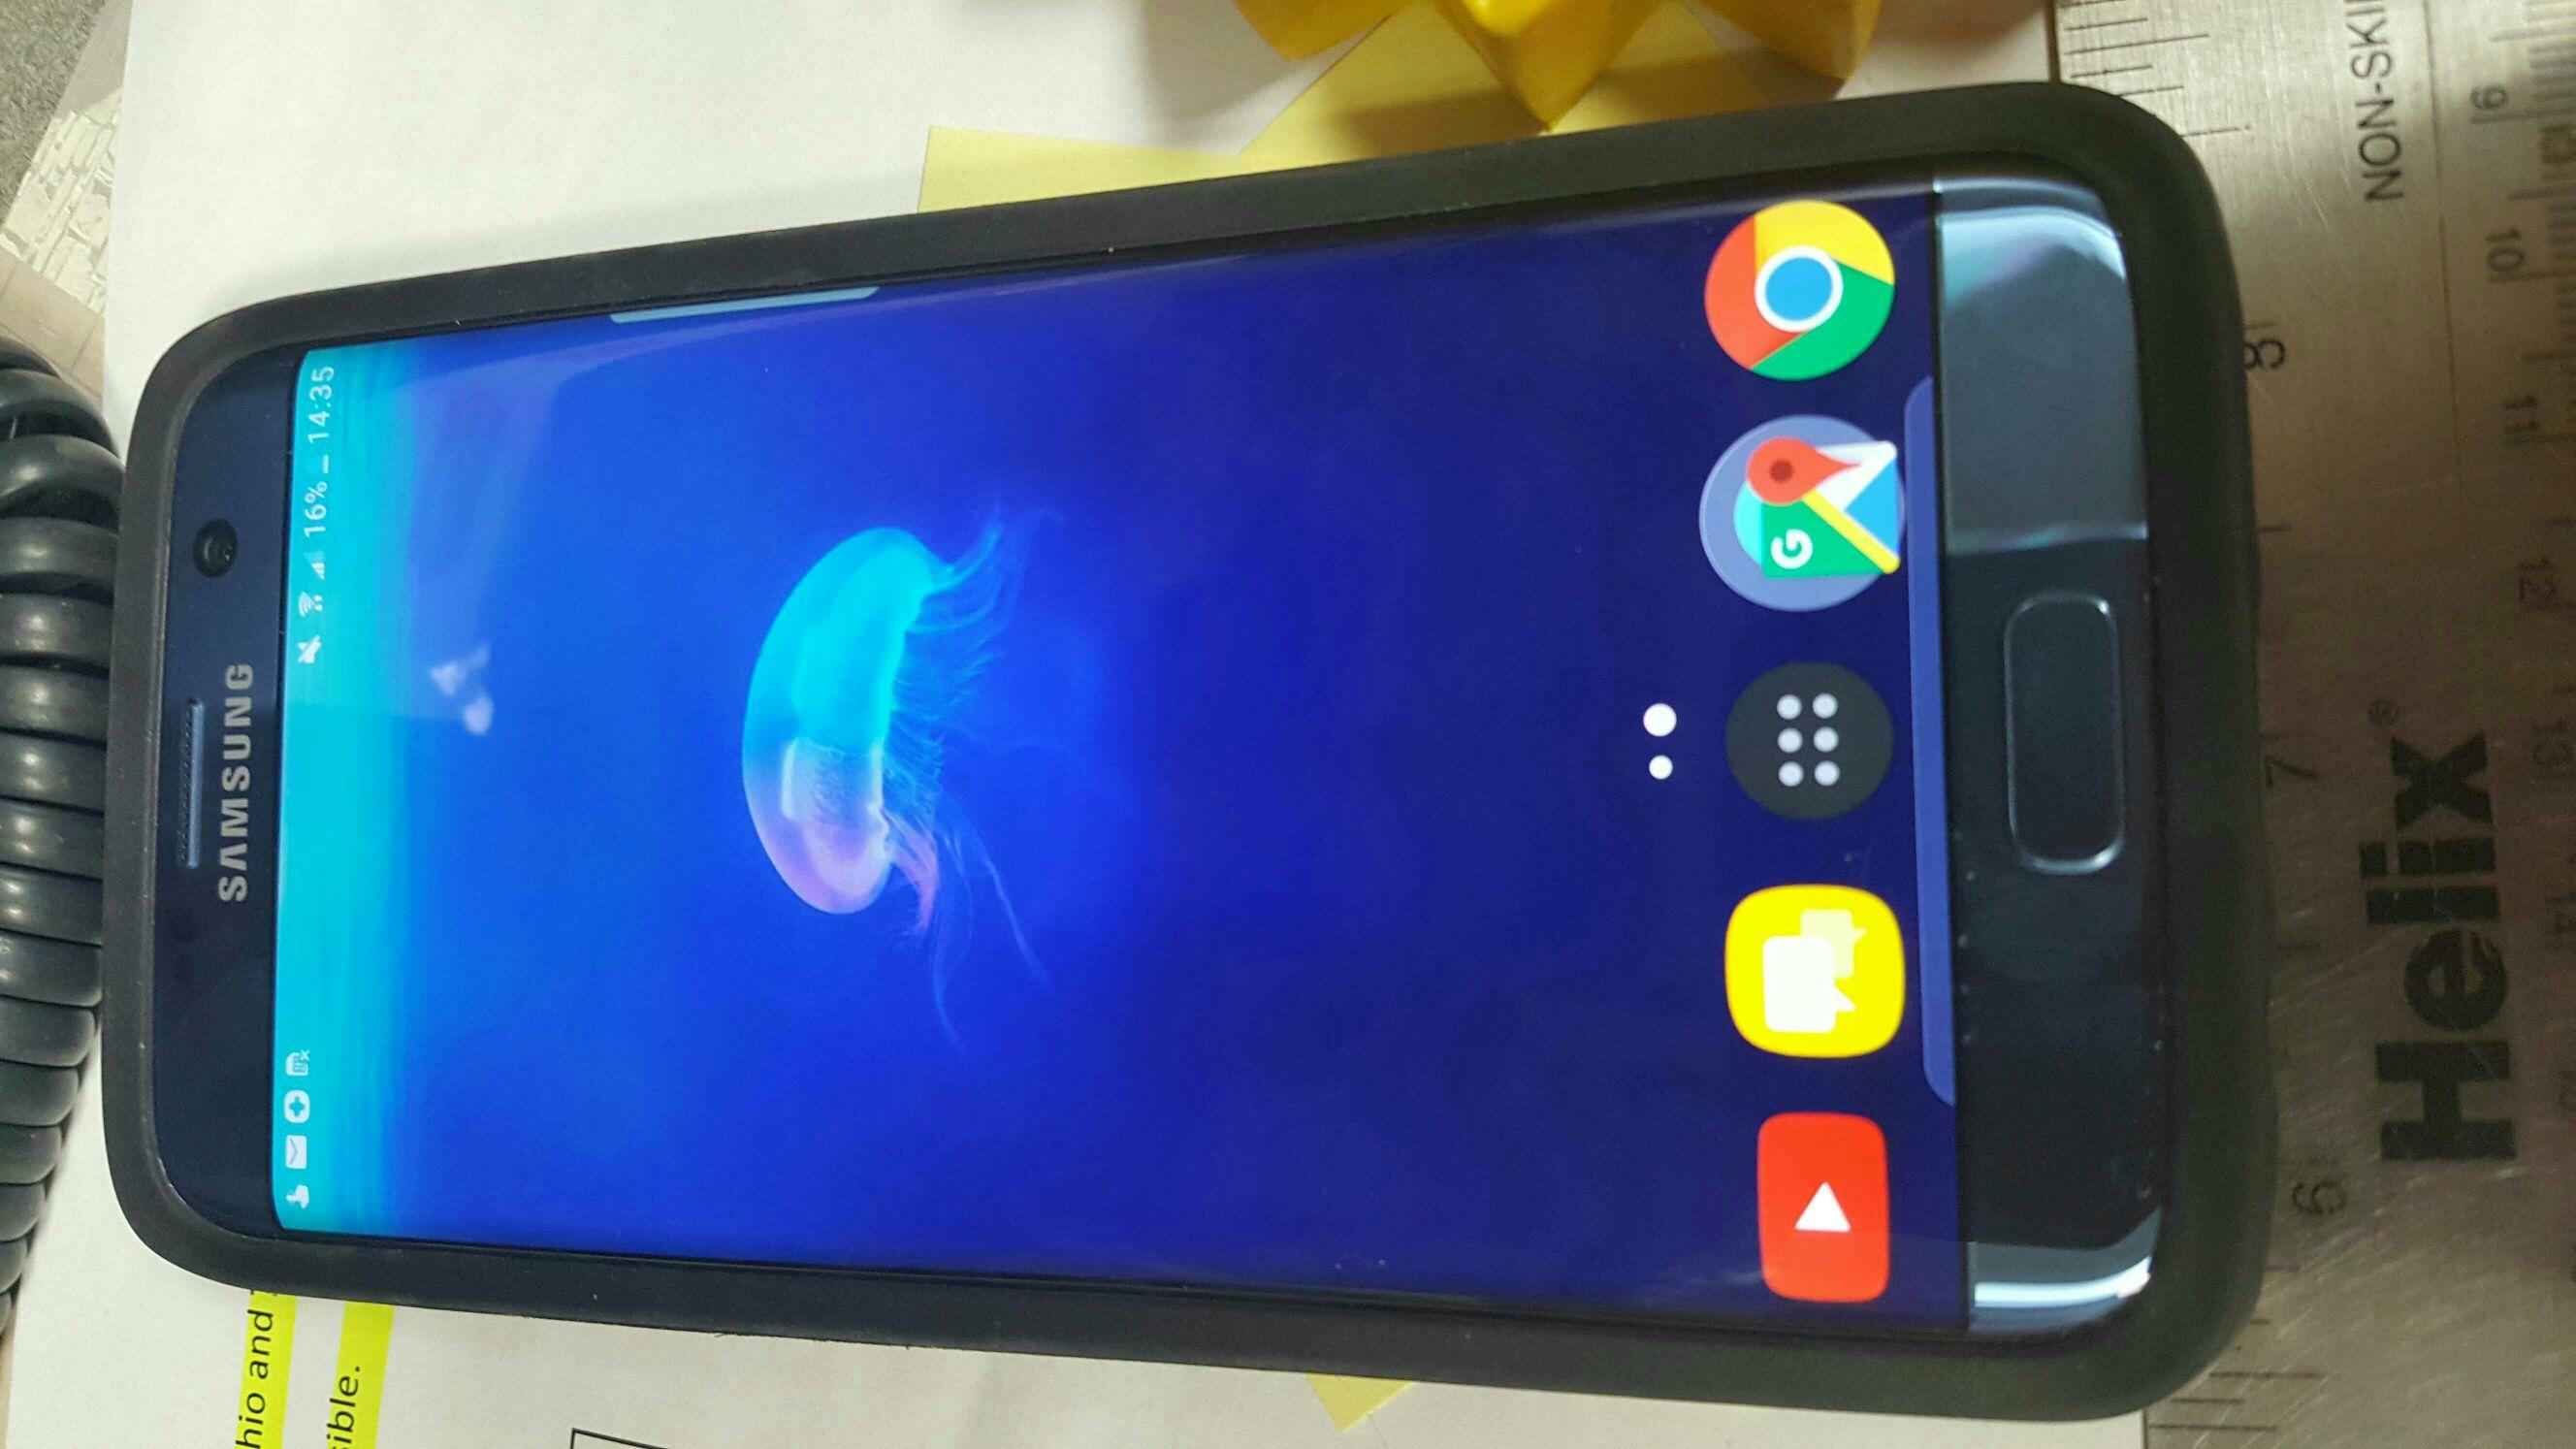 Galaxy S7 Edge Wallpapers: Samsung Galaxy S7 Edge Wallpapers